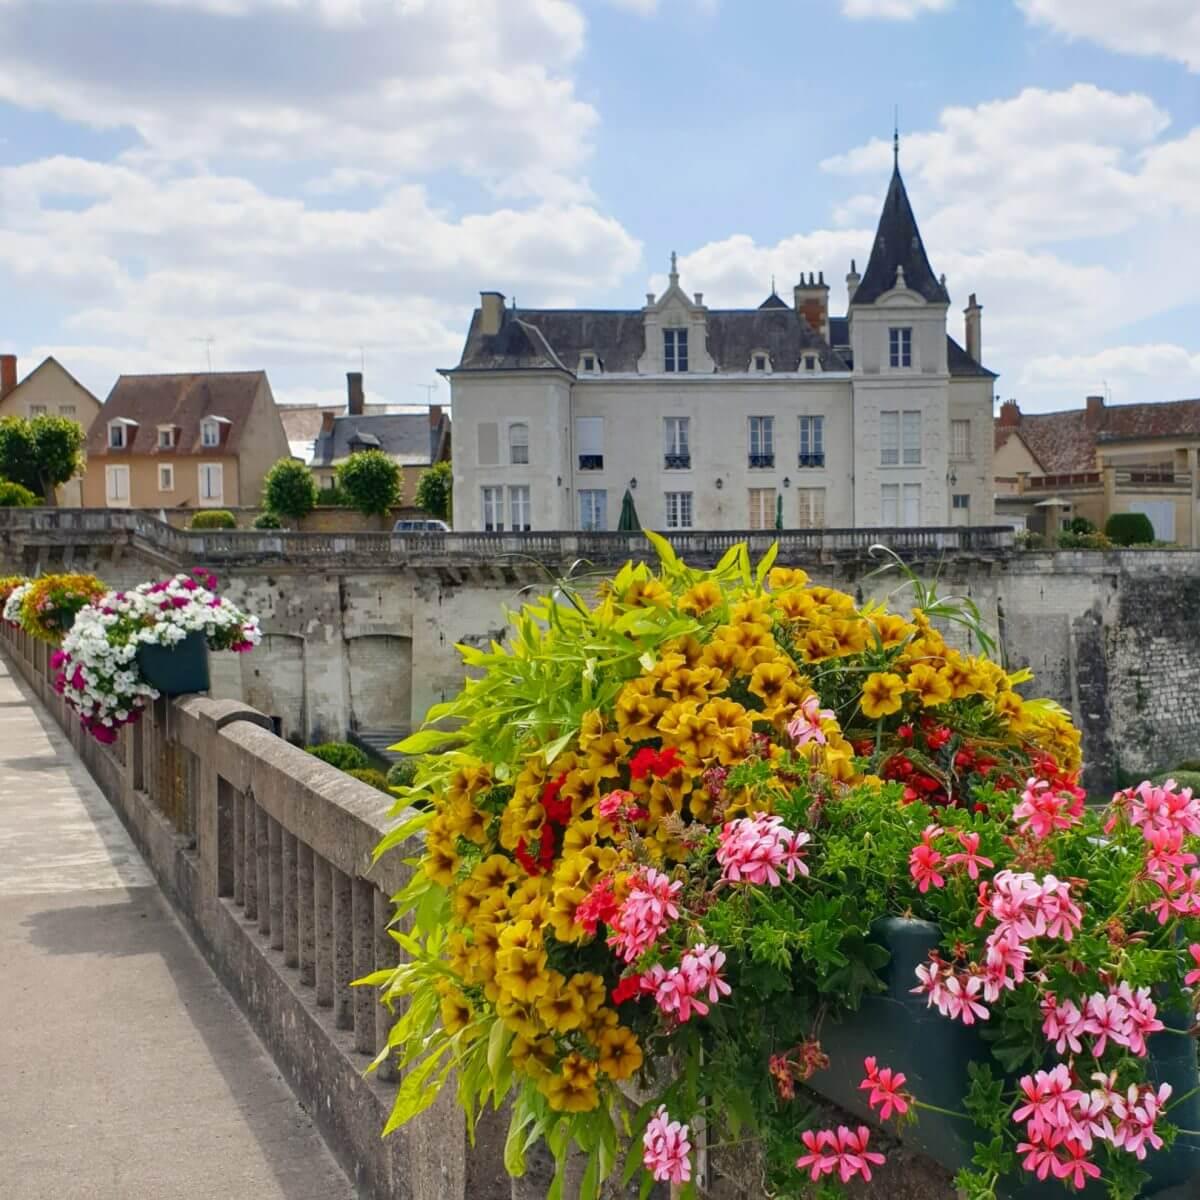 La Roche-Posay op de grens van de Vienne en Indre-et-Loire